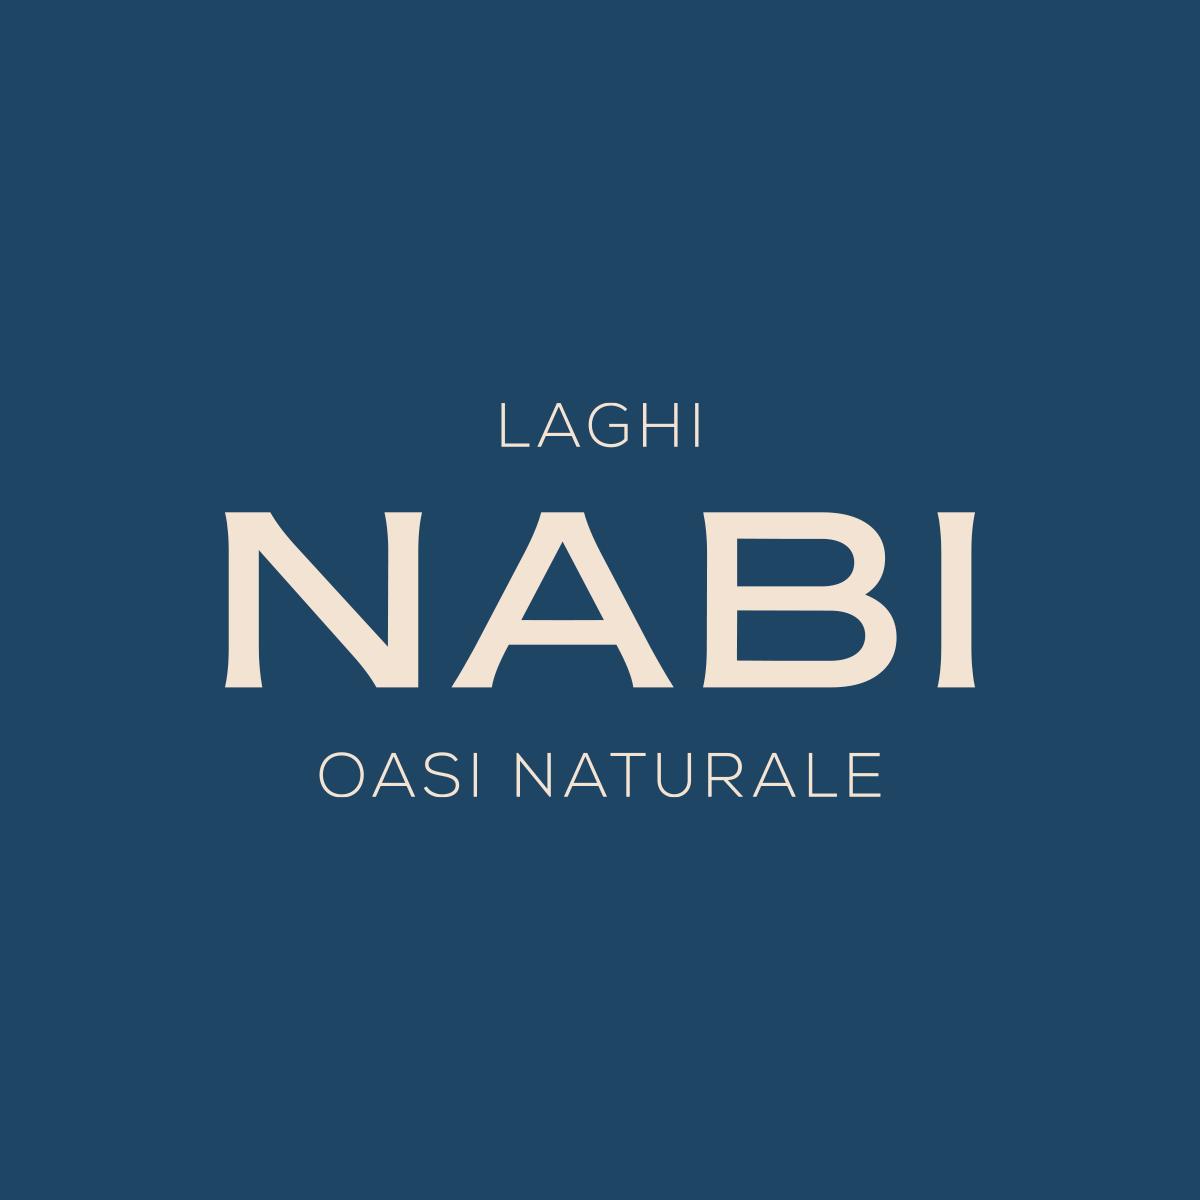 Laghi Nabi - Oasi Naturale